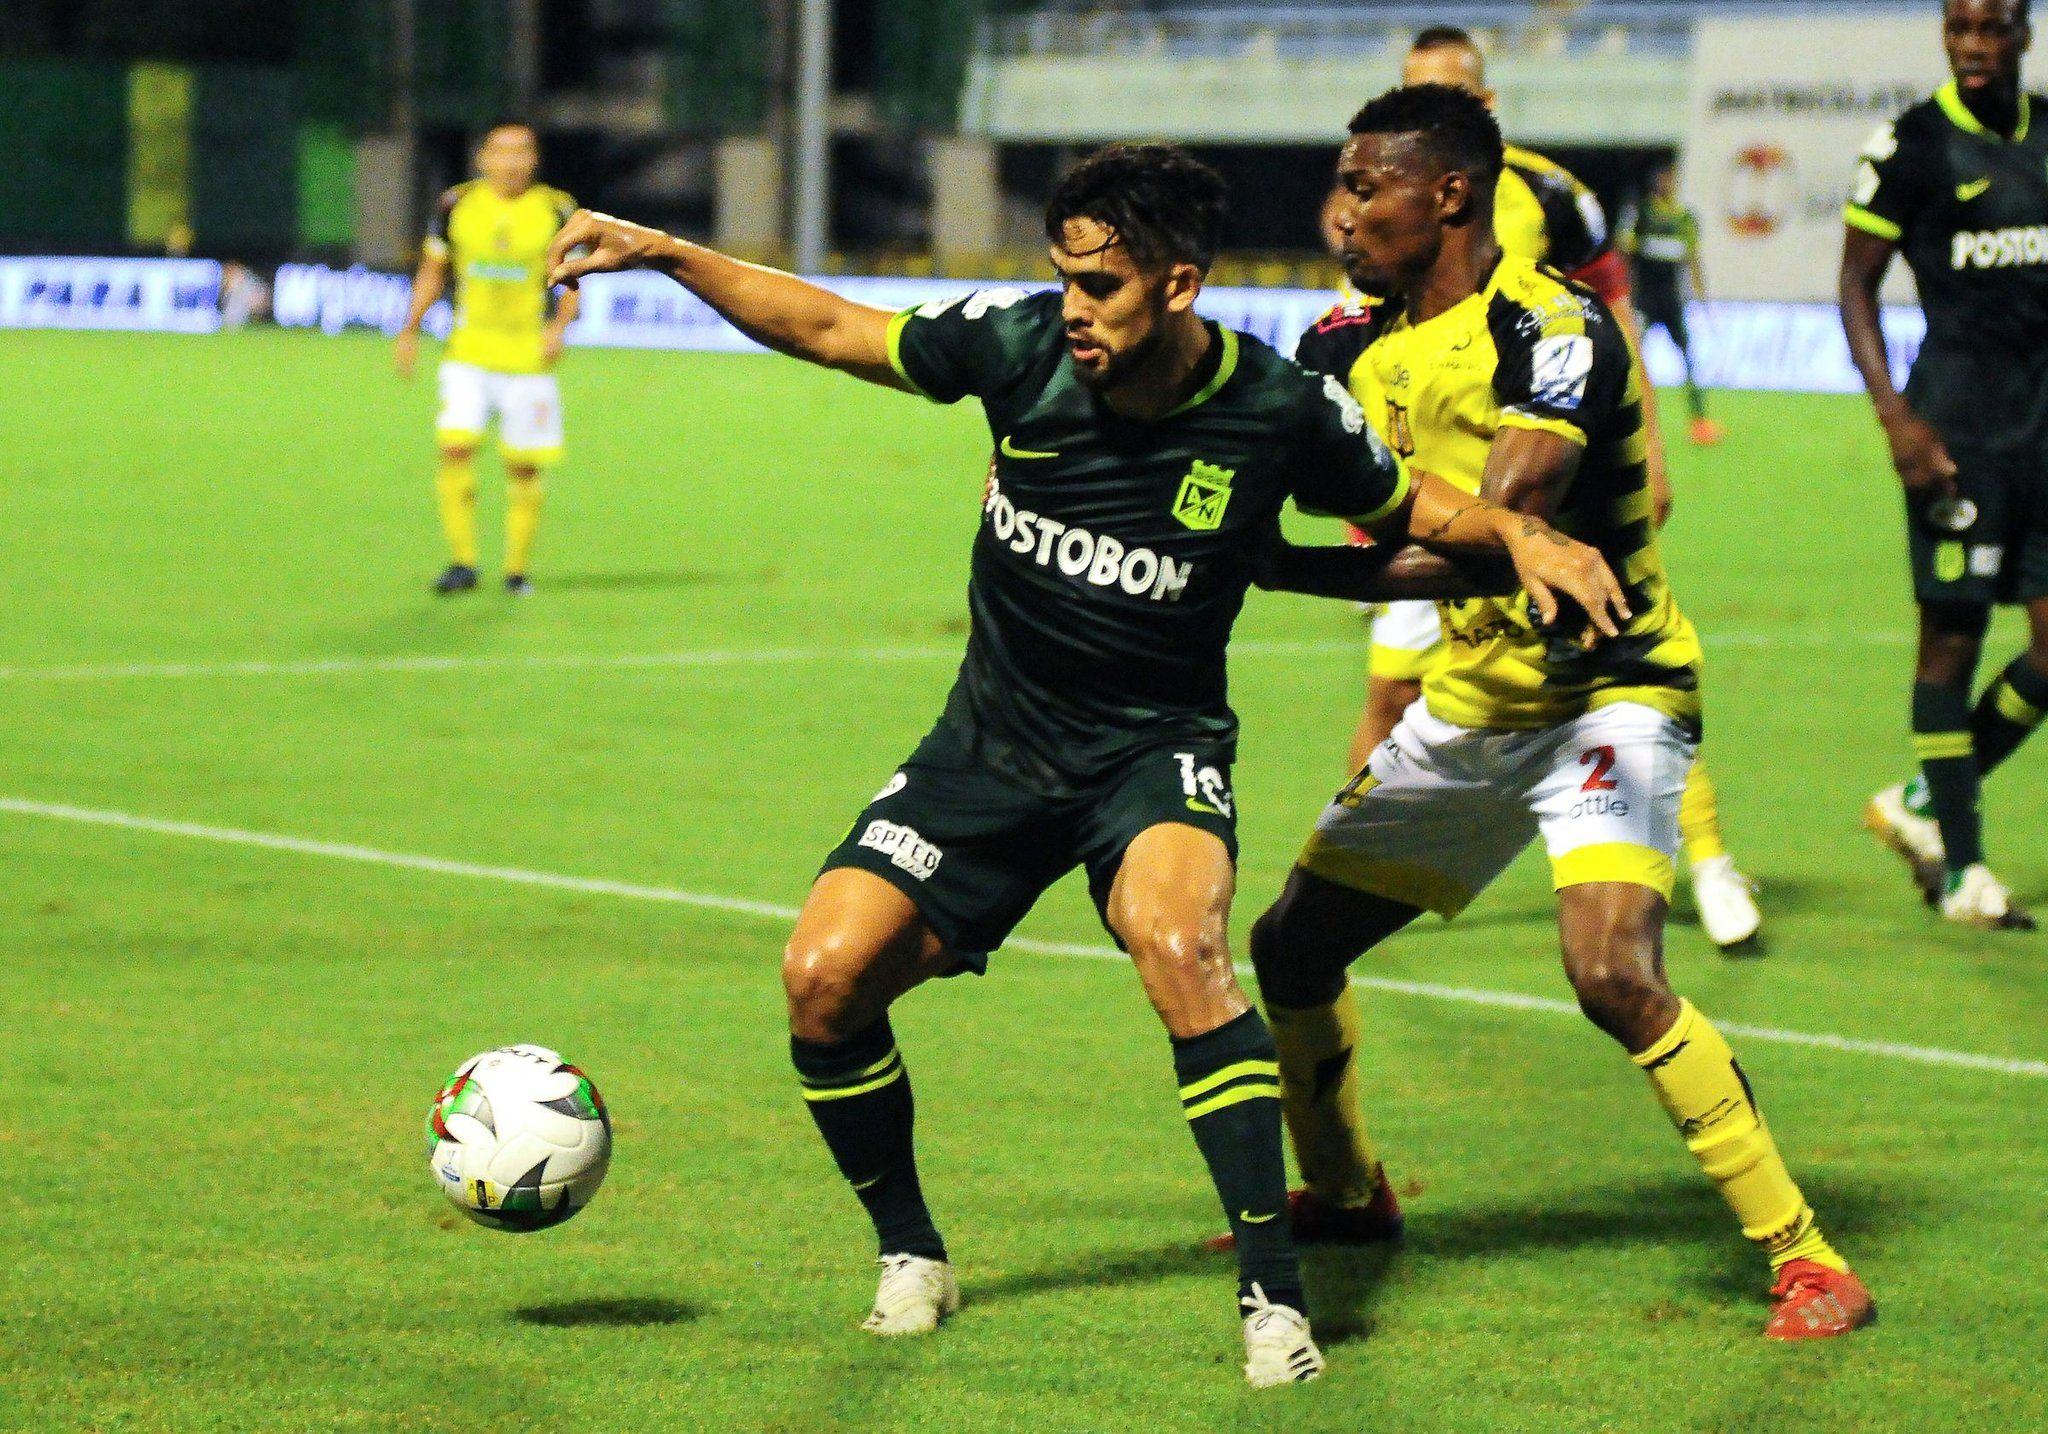 Otra baja para Nacional en Copa Libertadores: sin El Rifle en Paraguay